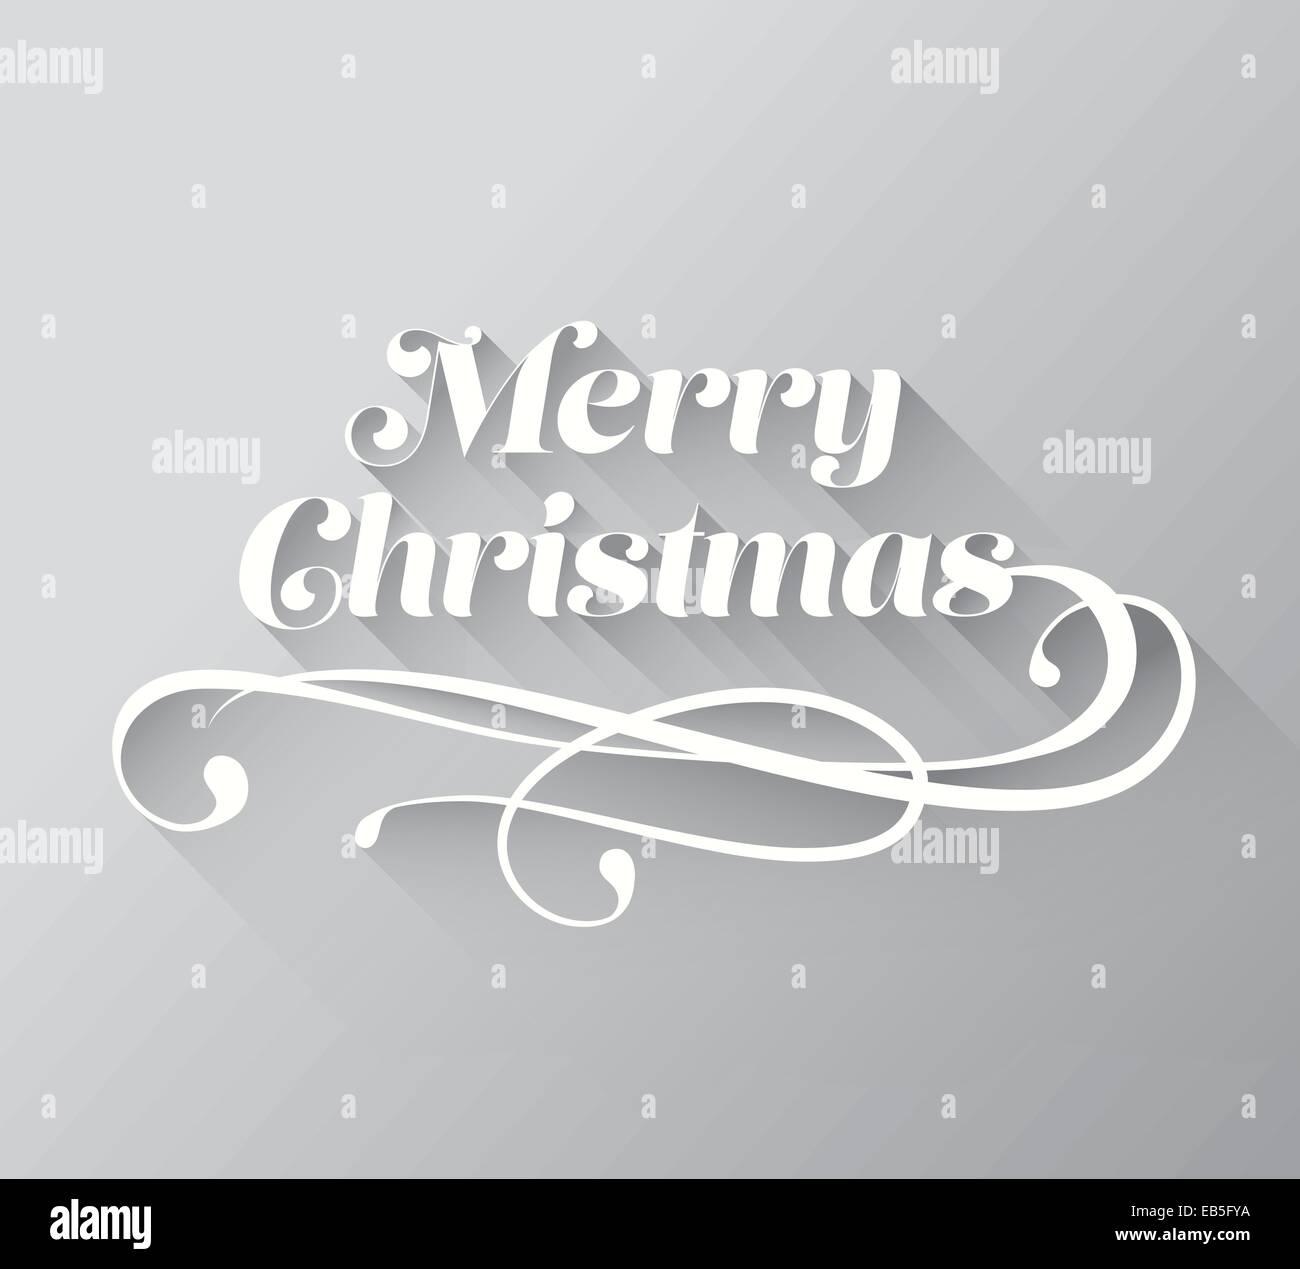 merry christmas cursive message vector stock image